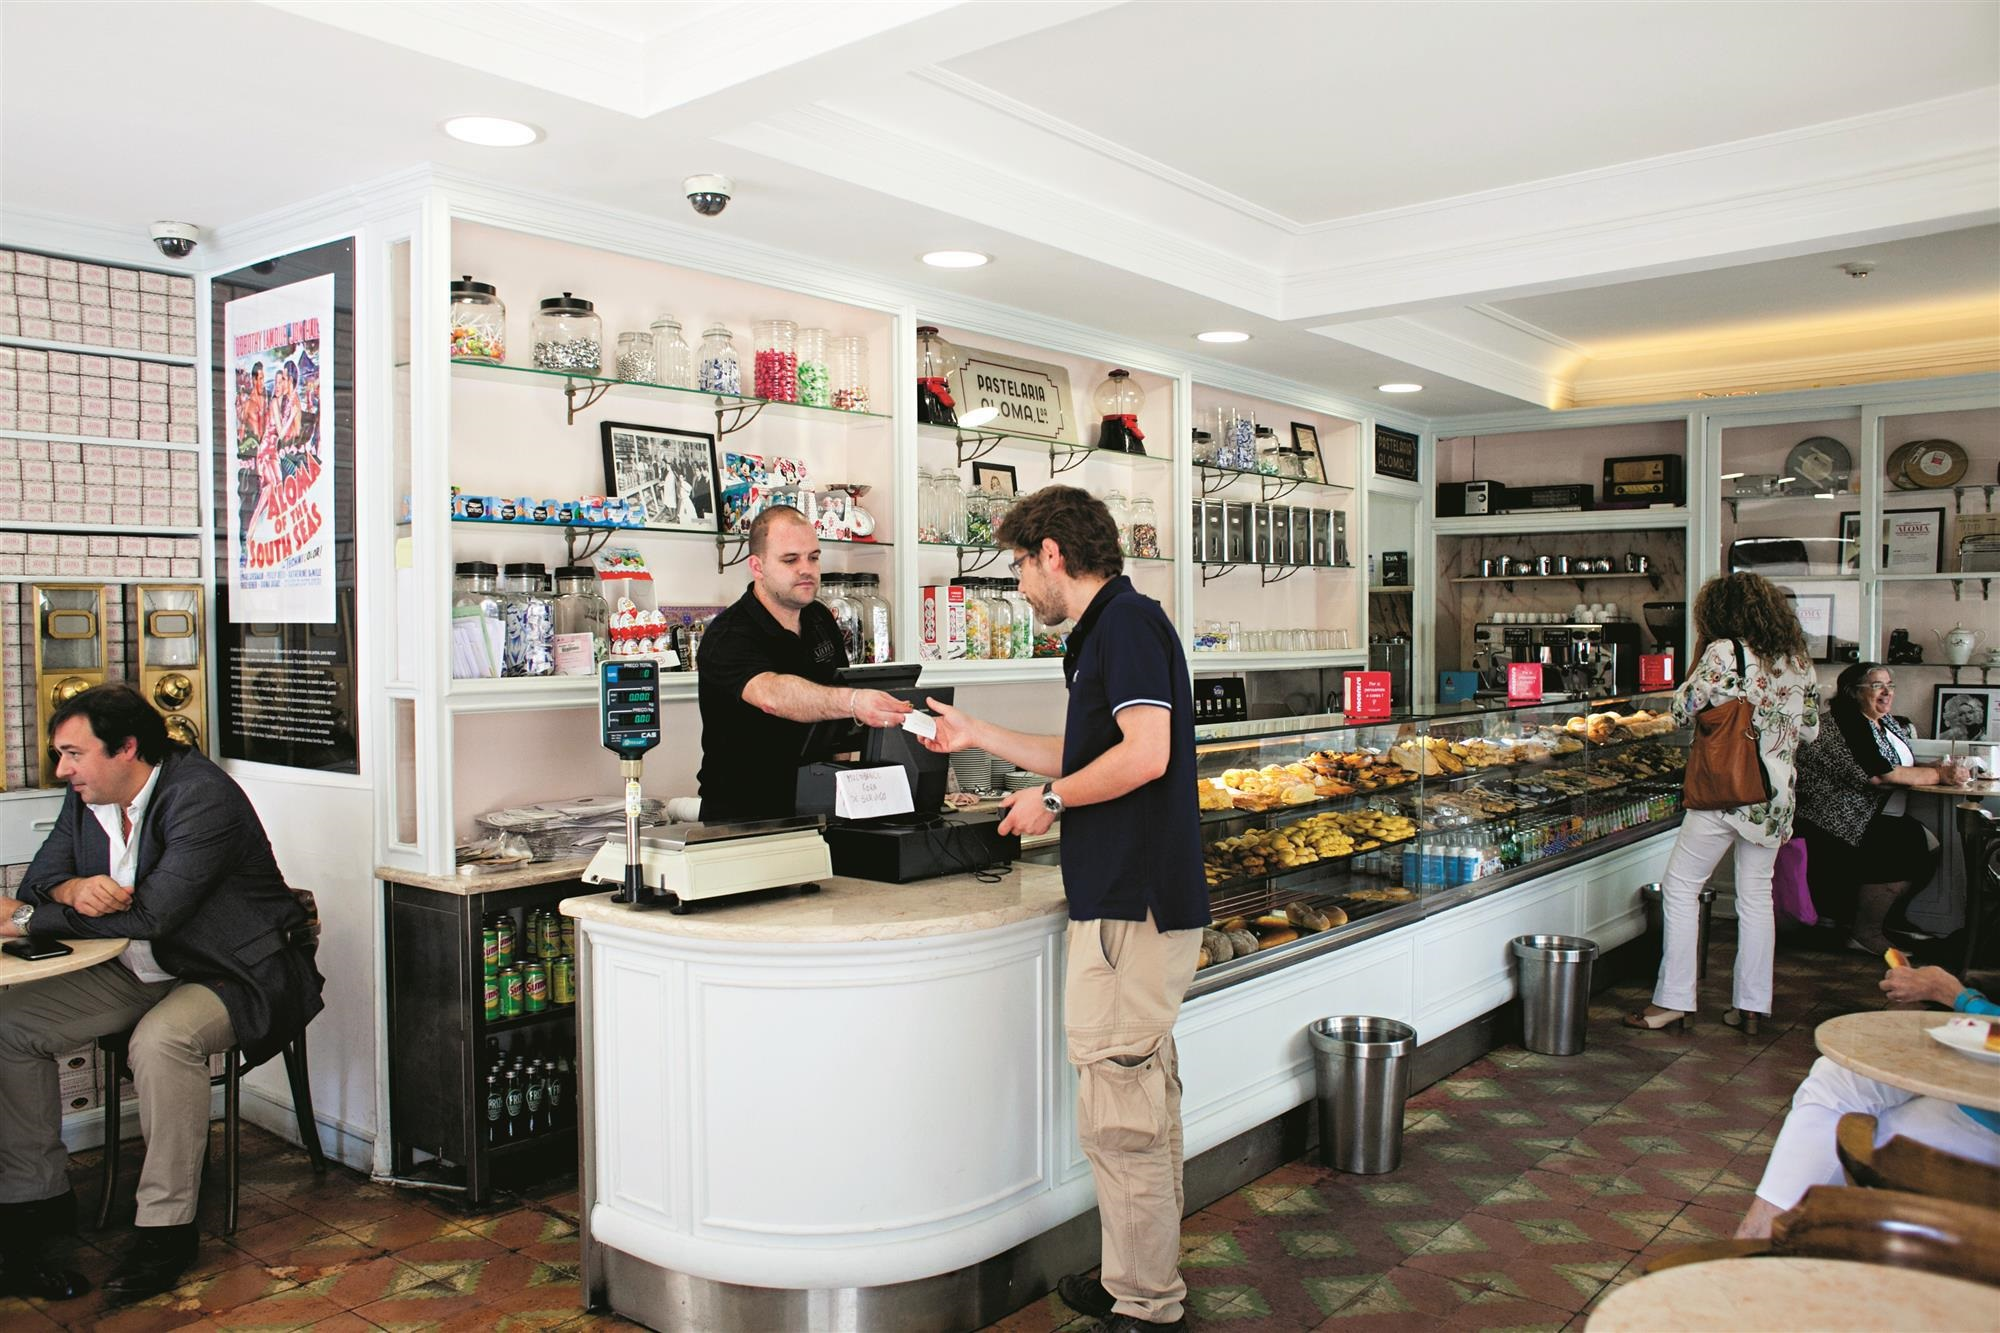 Pastelaria Aloma - Store for natas - Lisbon - Photo by seeyourmag